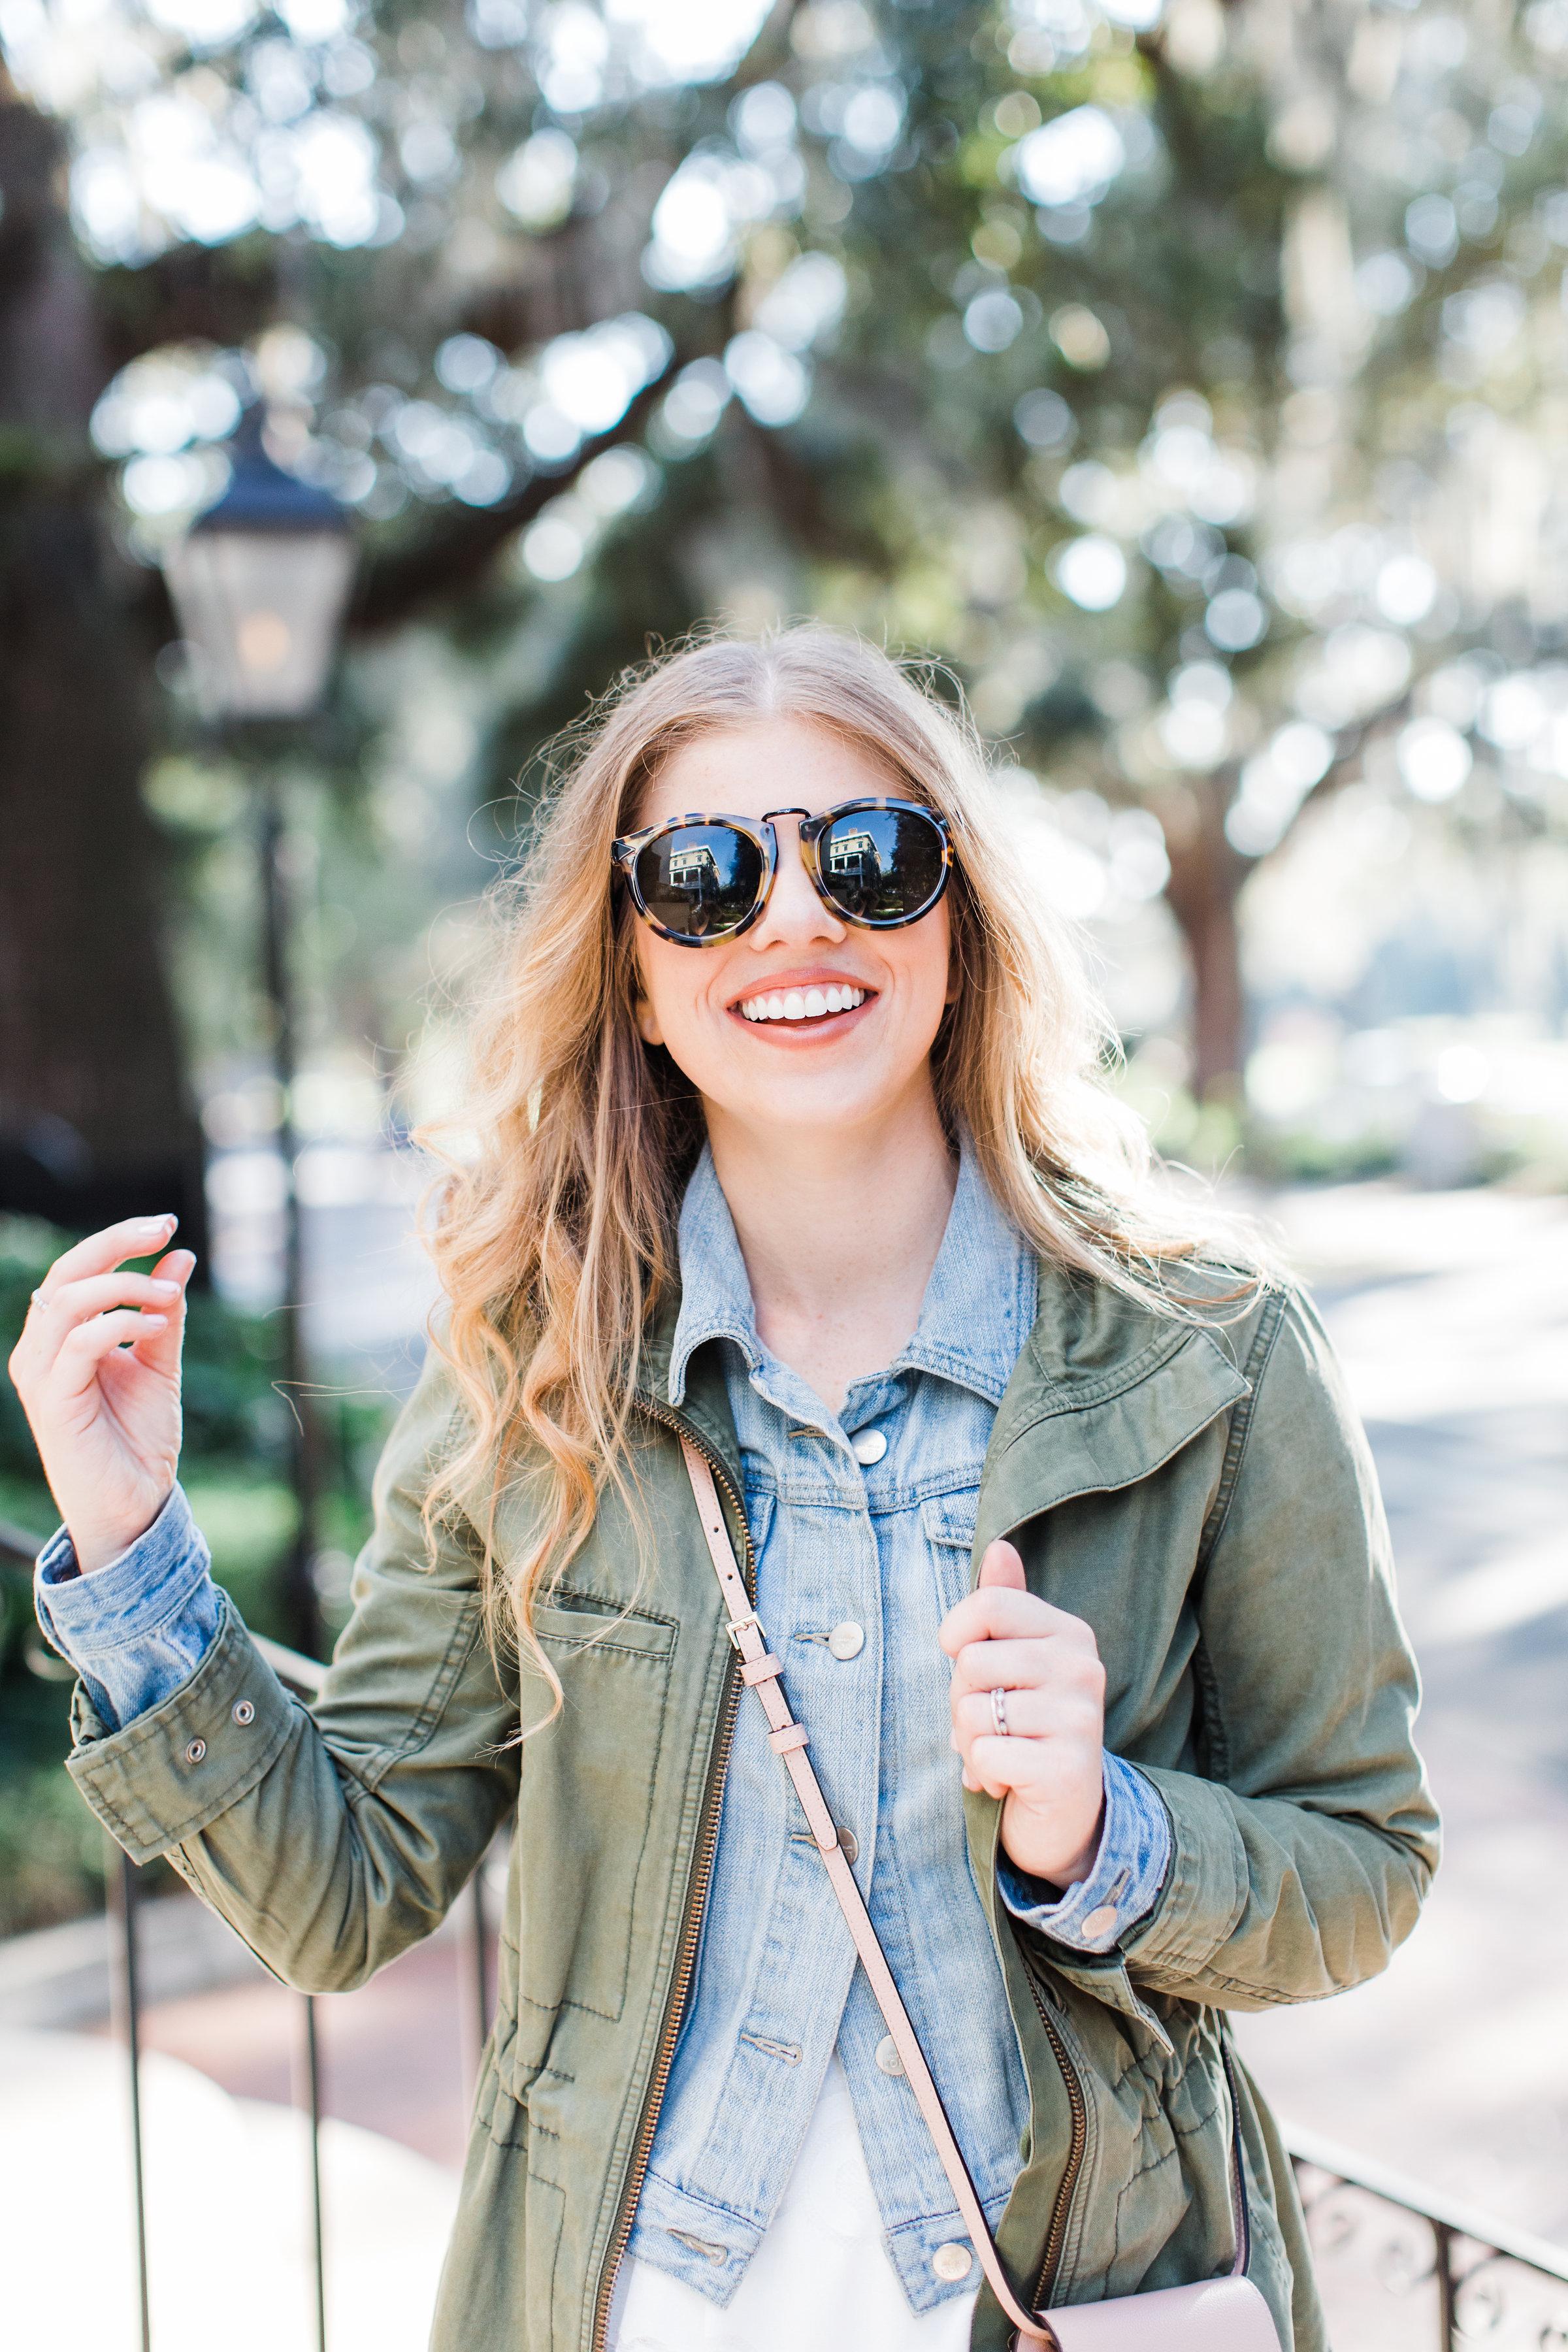 Fall Capsule Wardrobe | Midi Skirt for Fall | Louella Reese Life & Style Blog